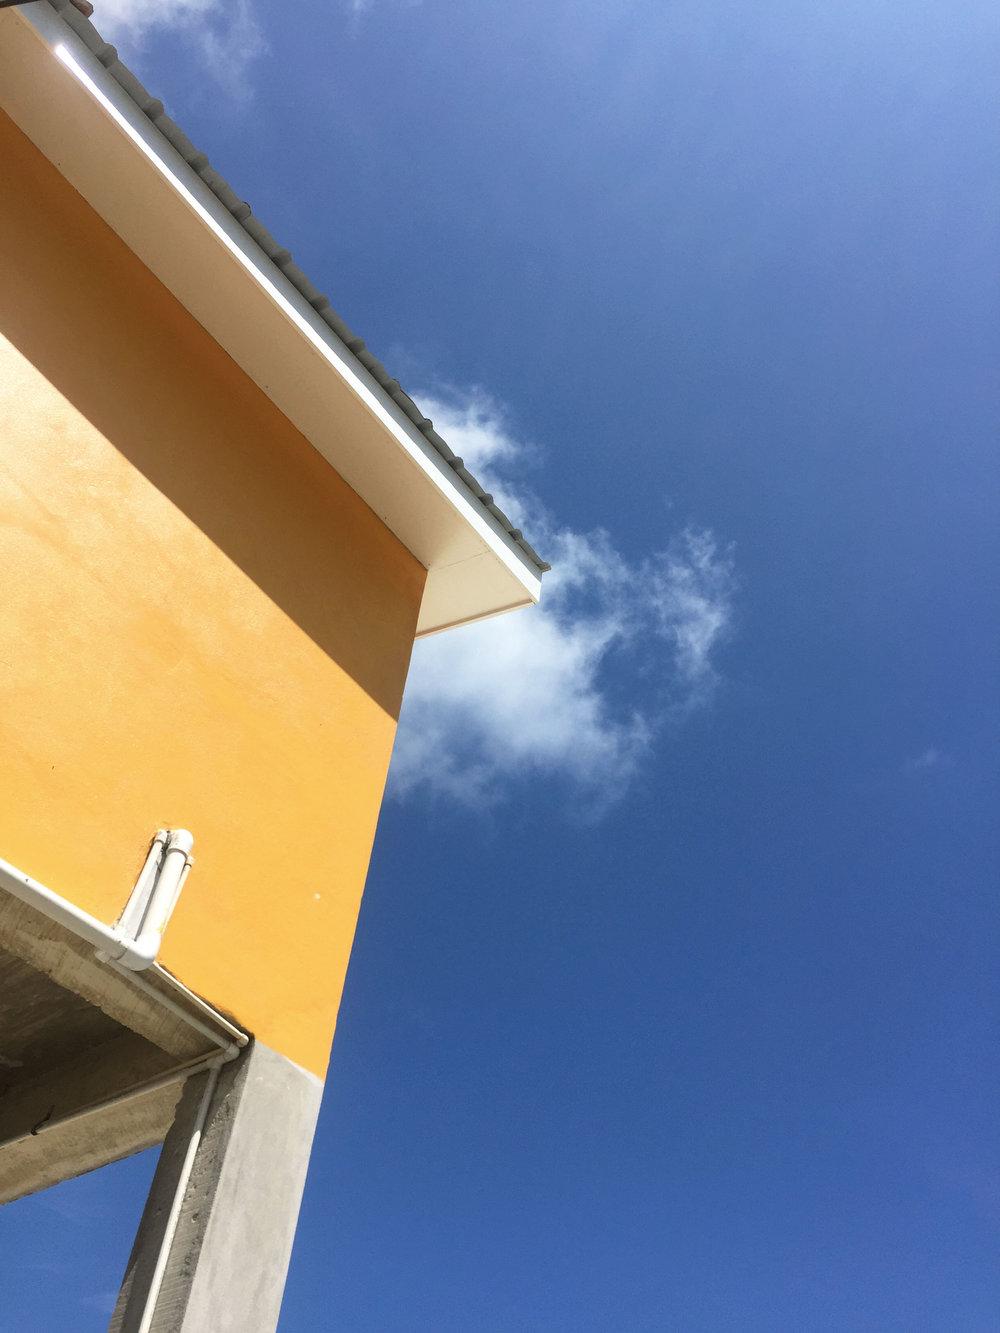 clouds_ameliagoss.jpg